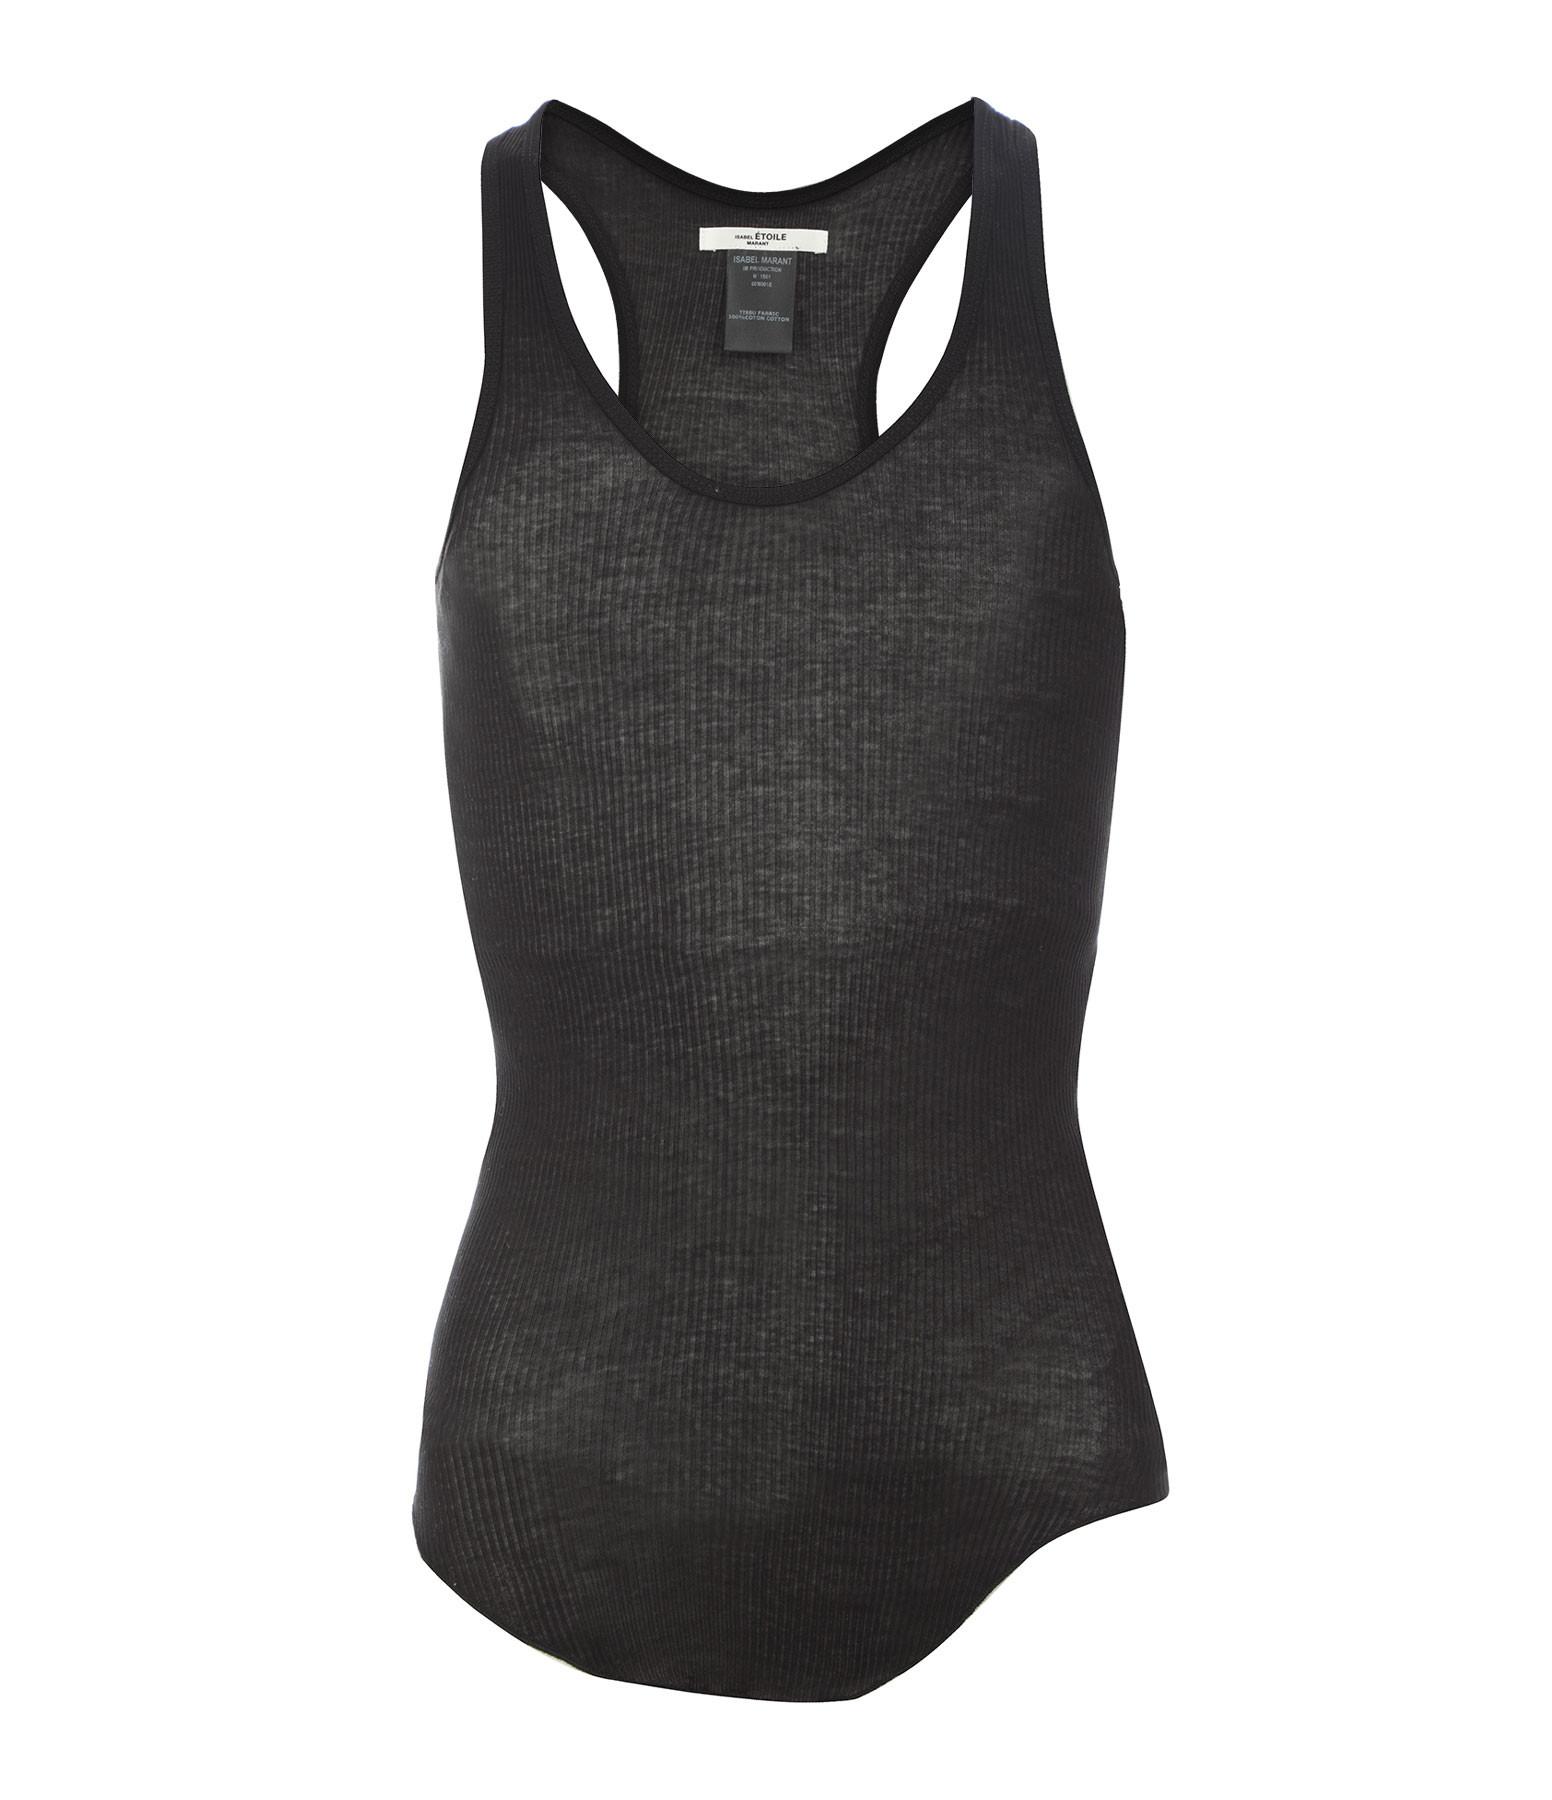 ISABEL MARANT ÉTOILE - Tee-shirt Louisa Coton Noir